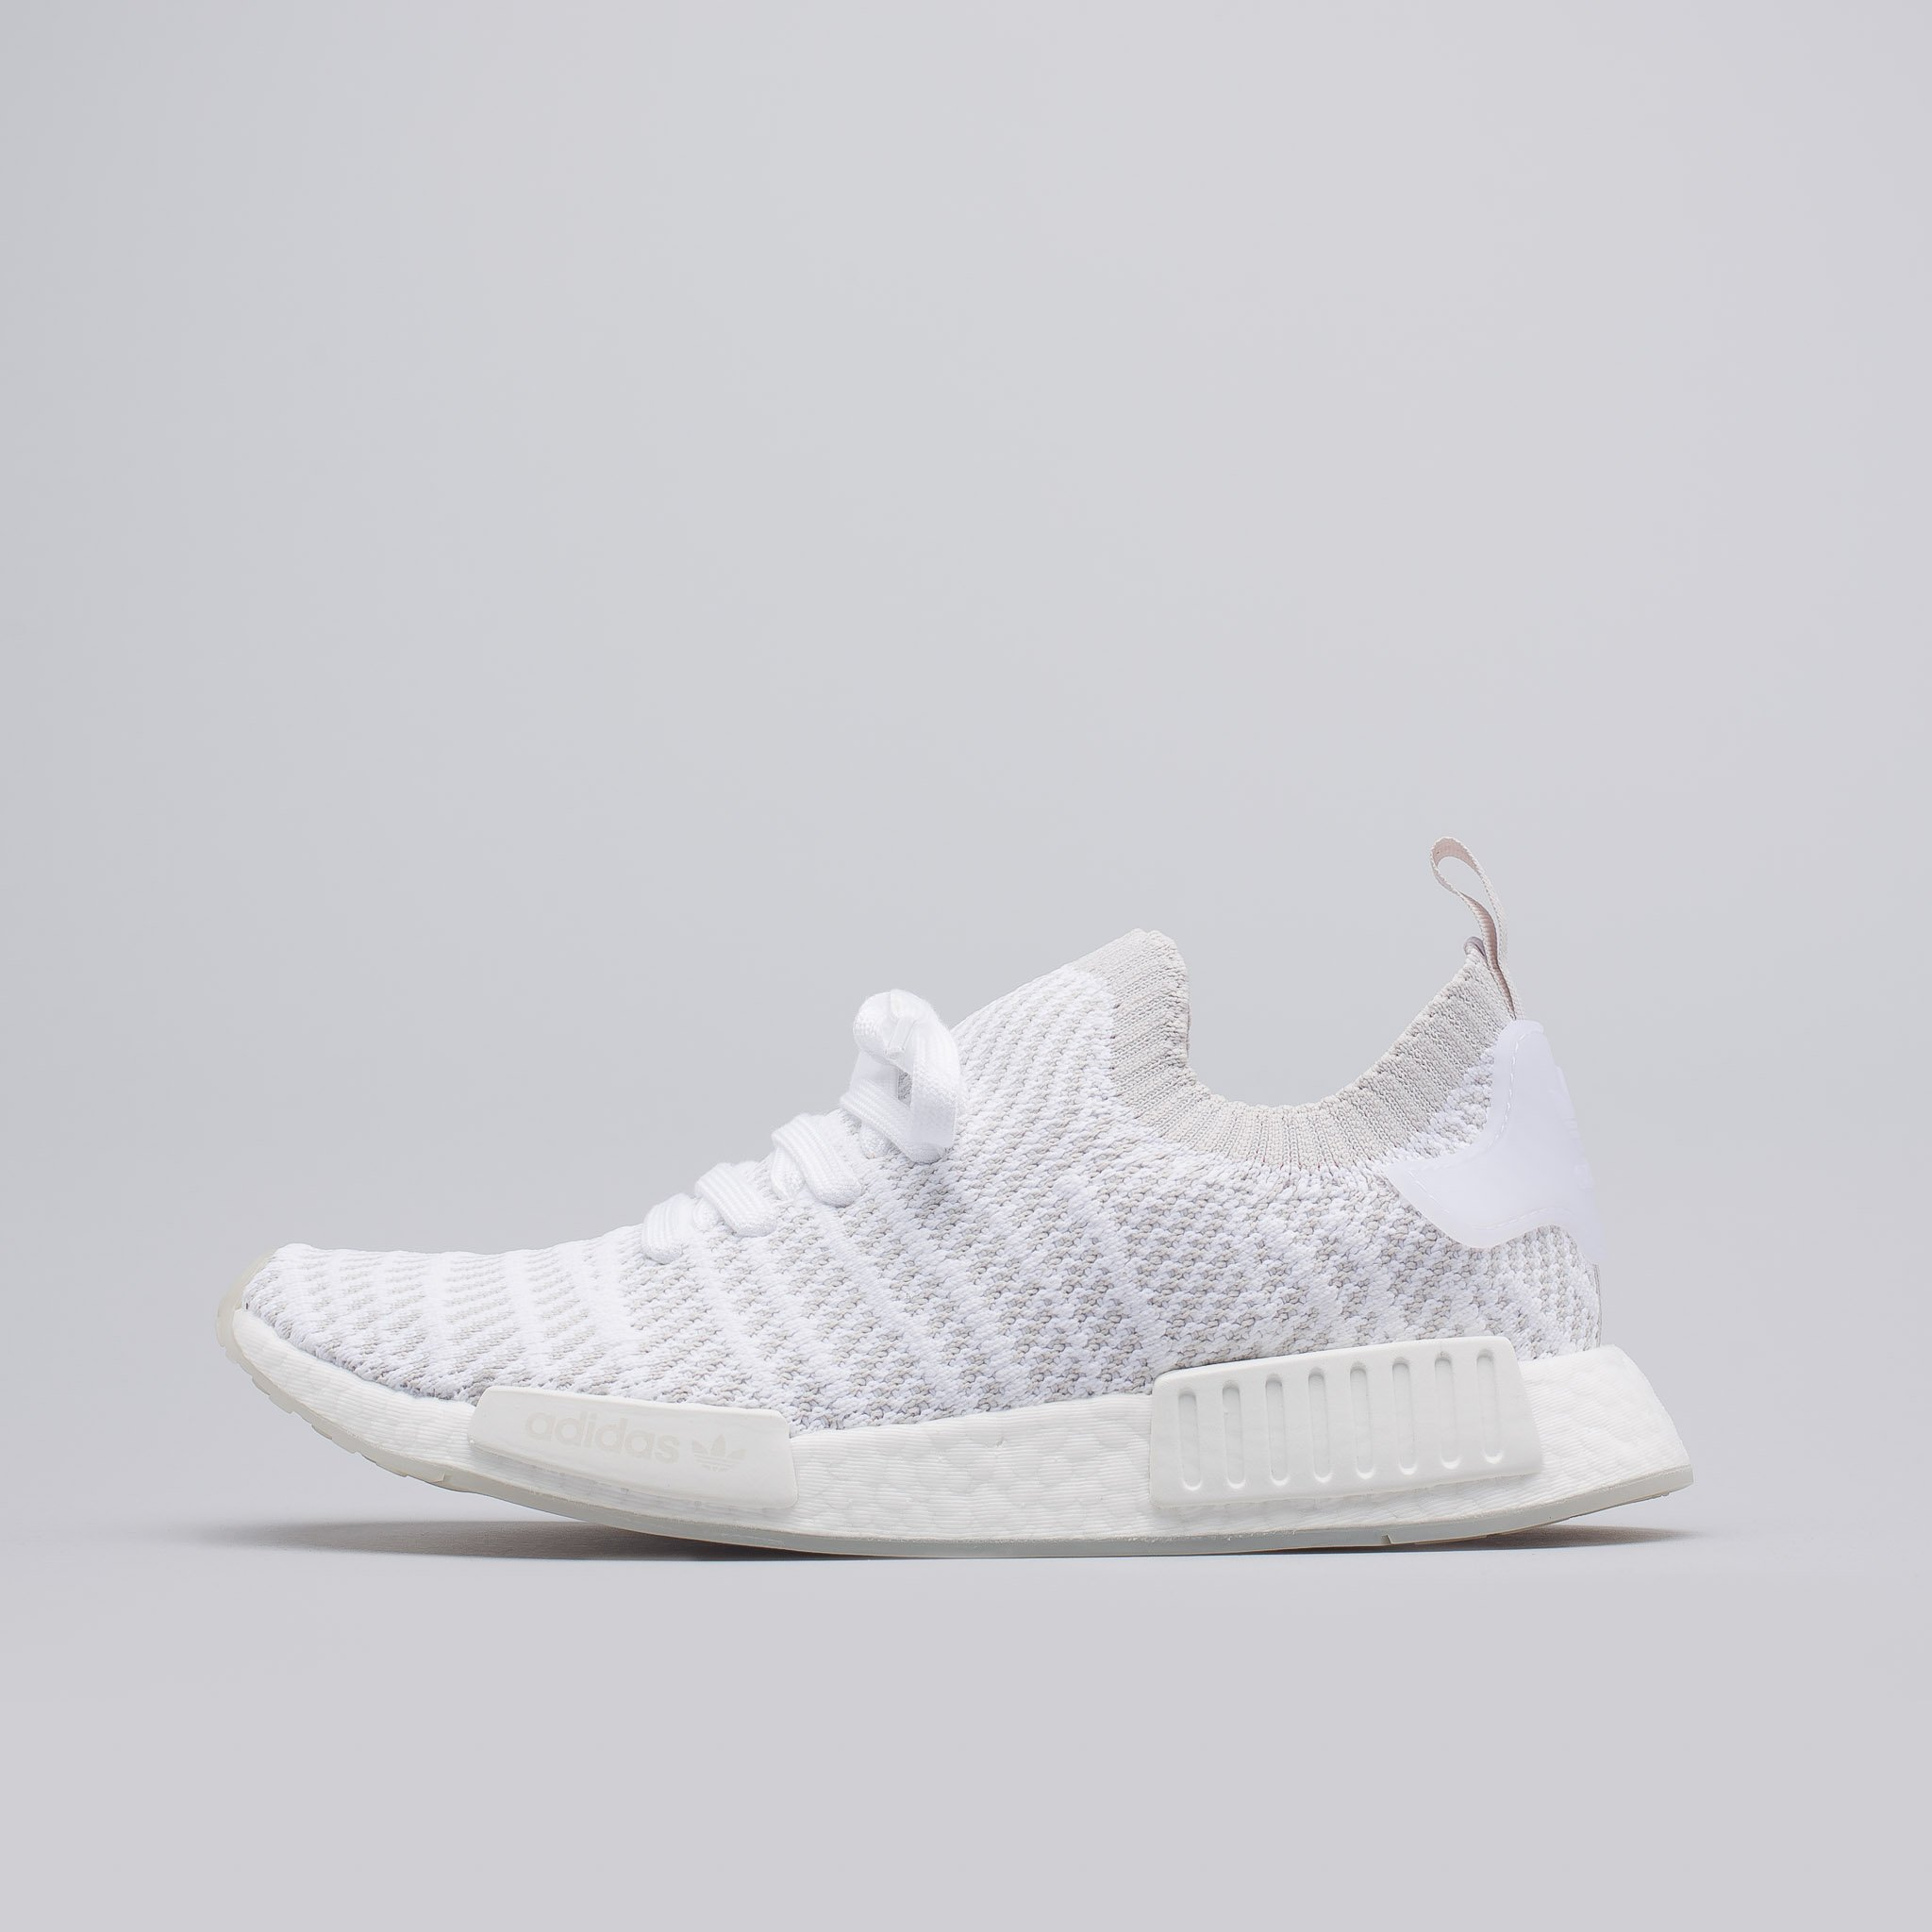 NMD R1 STLT Primeknit in White | Nmd r1, Nmd, Sneakers